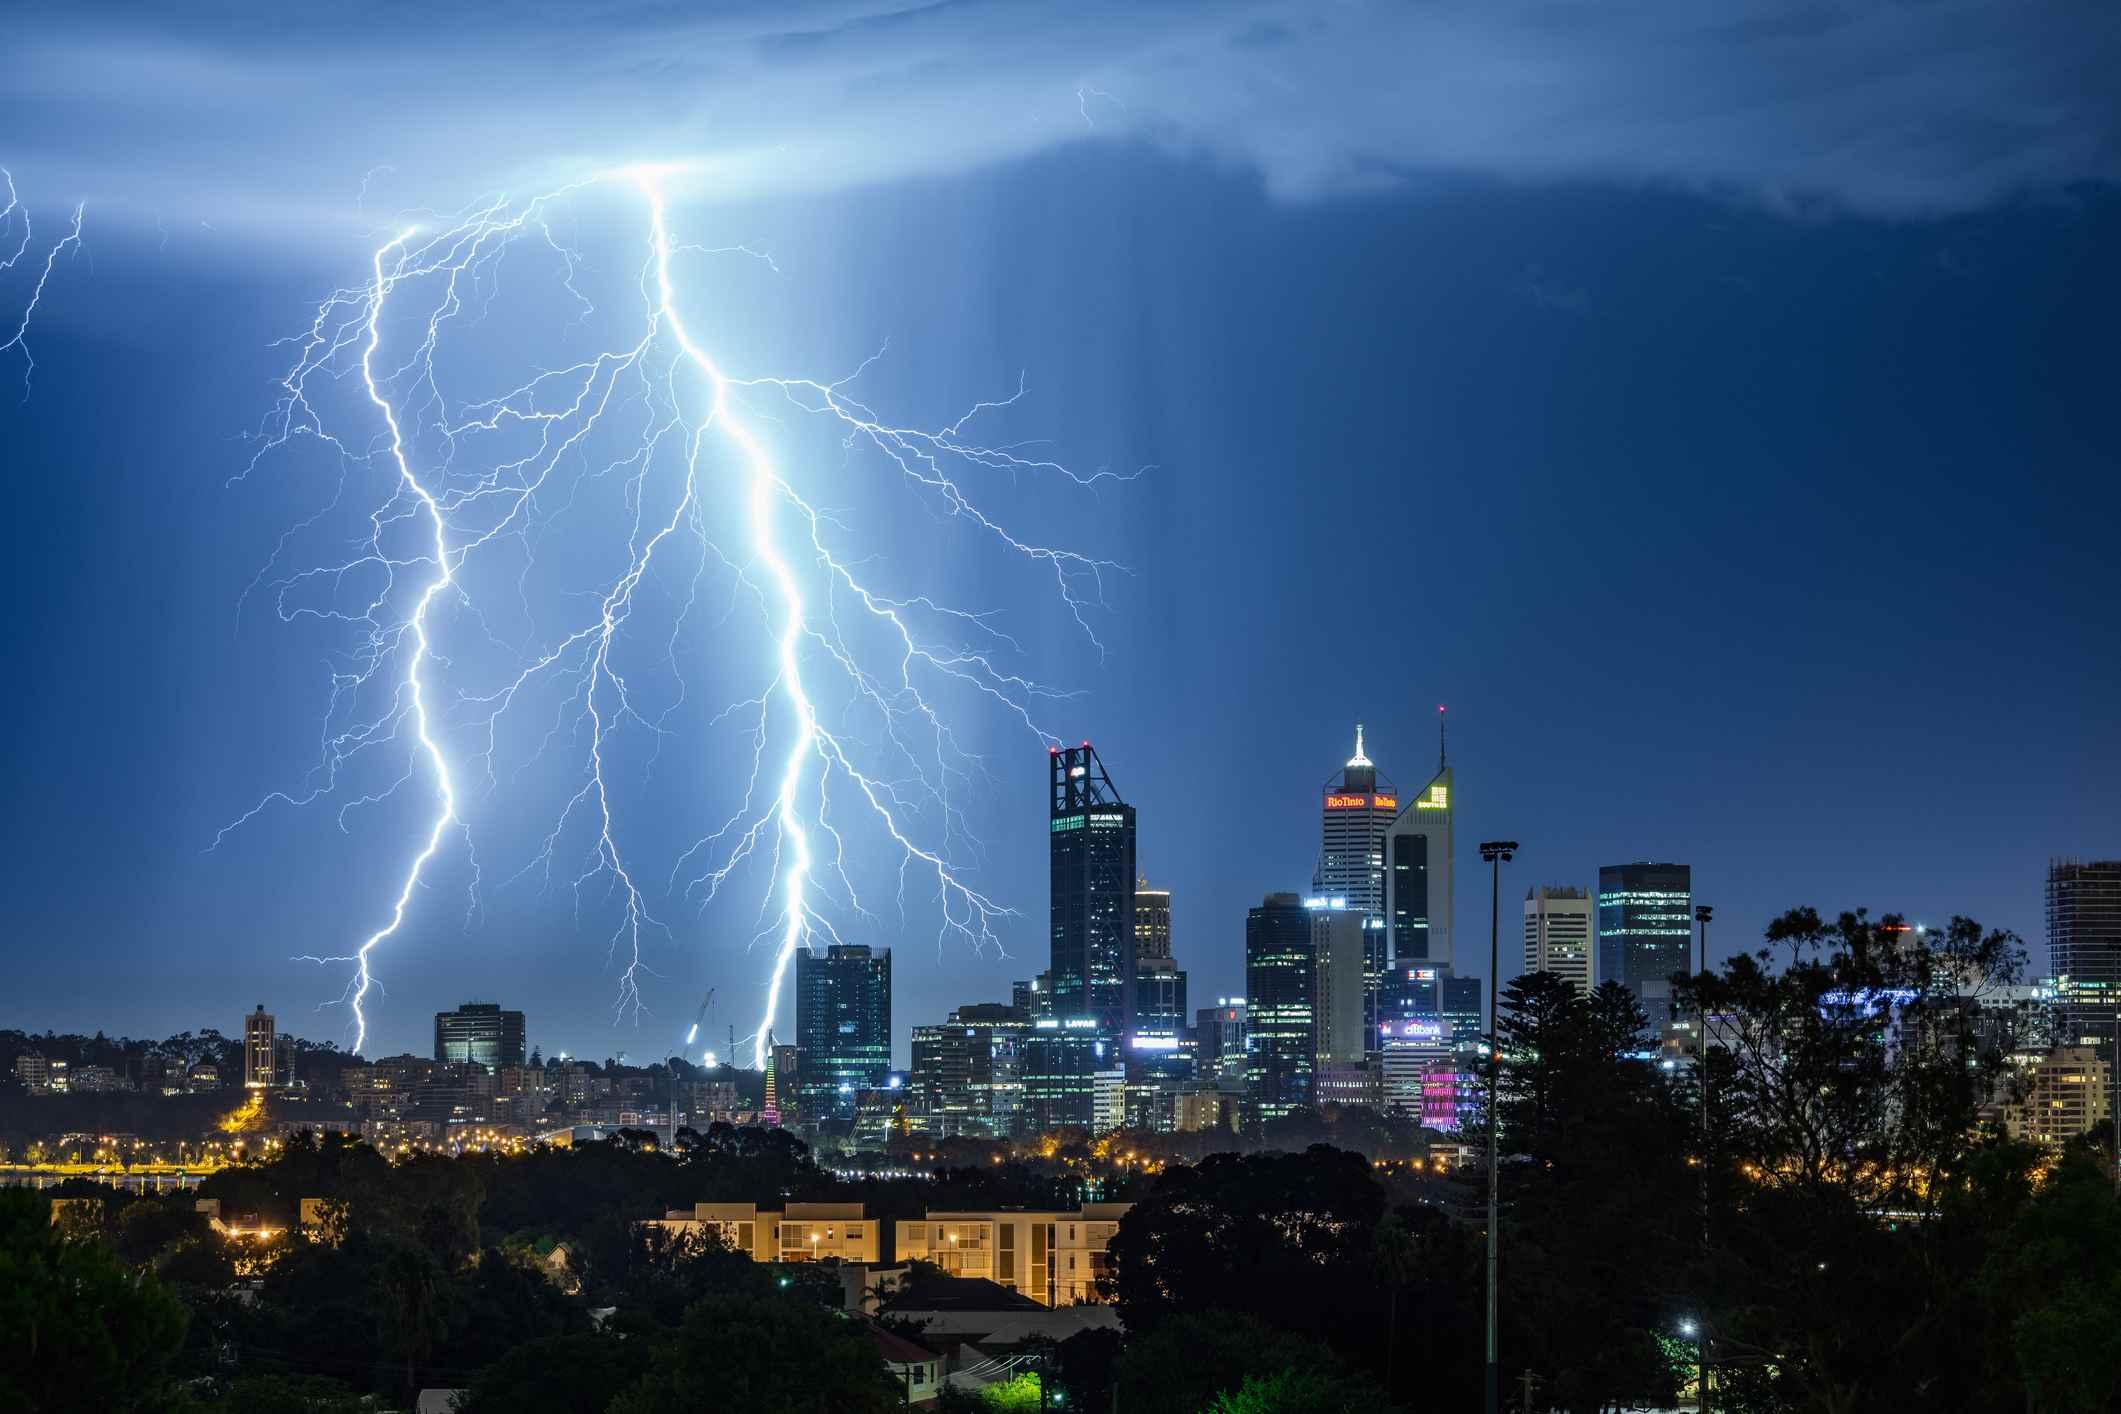 Lightning Strikes Over a Metropolis